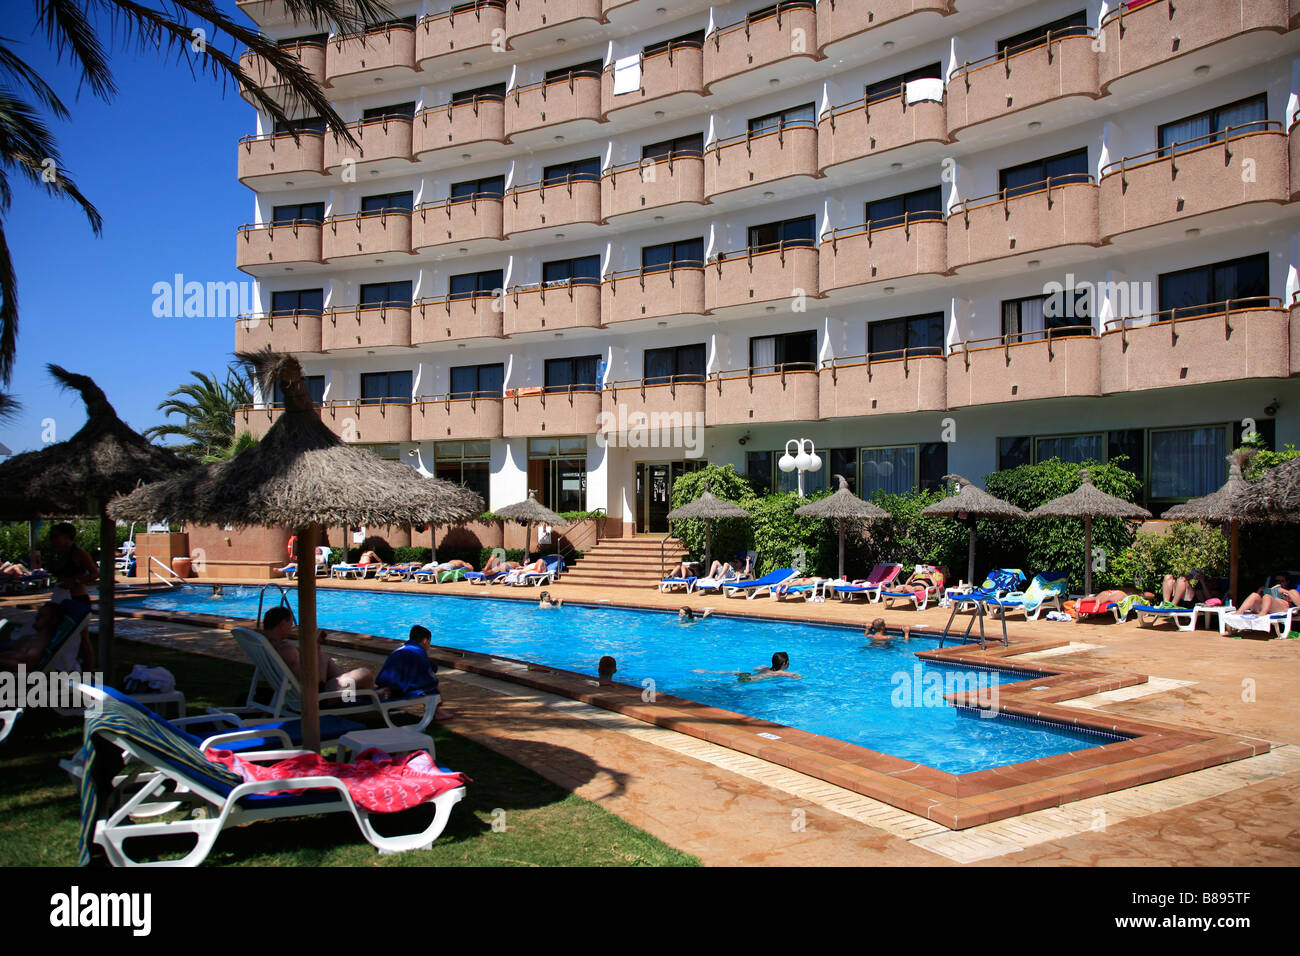 Swimming Pool at 4star Hotel Maritimo Puerto de Alcudia Town Mallorca Majorca Island Balearic Isles Mediterranean - Stock Image